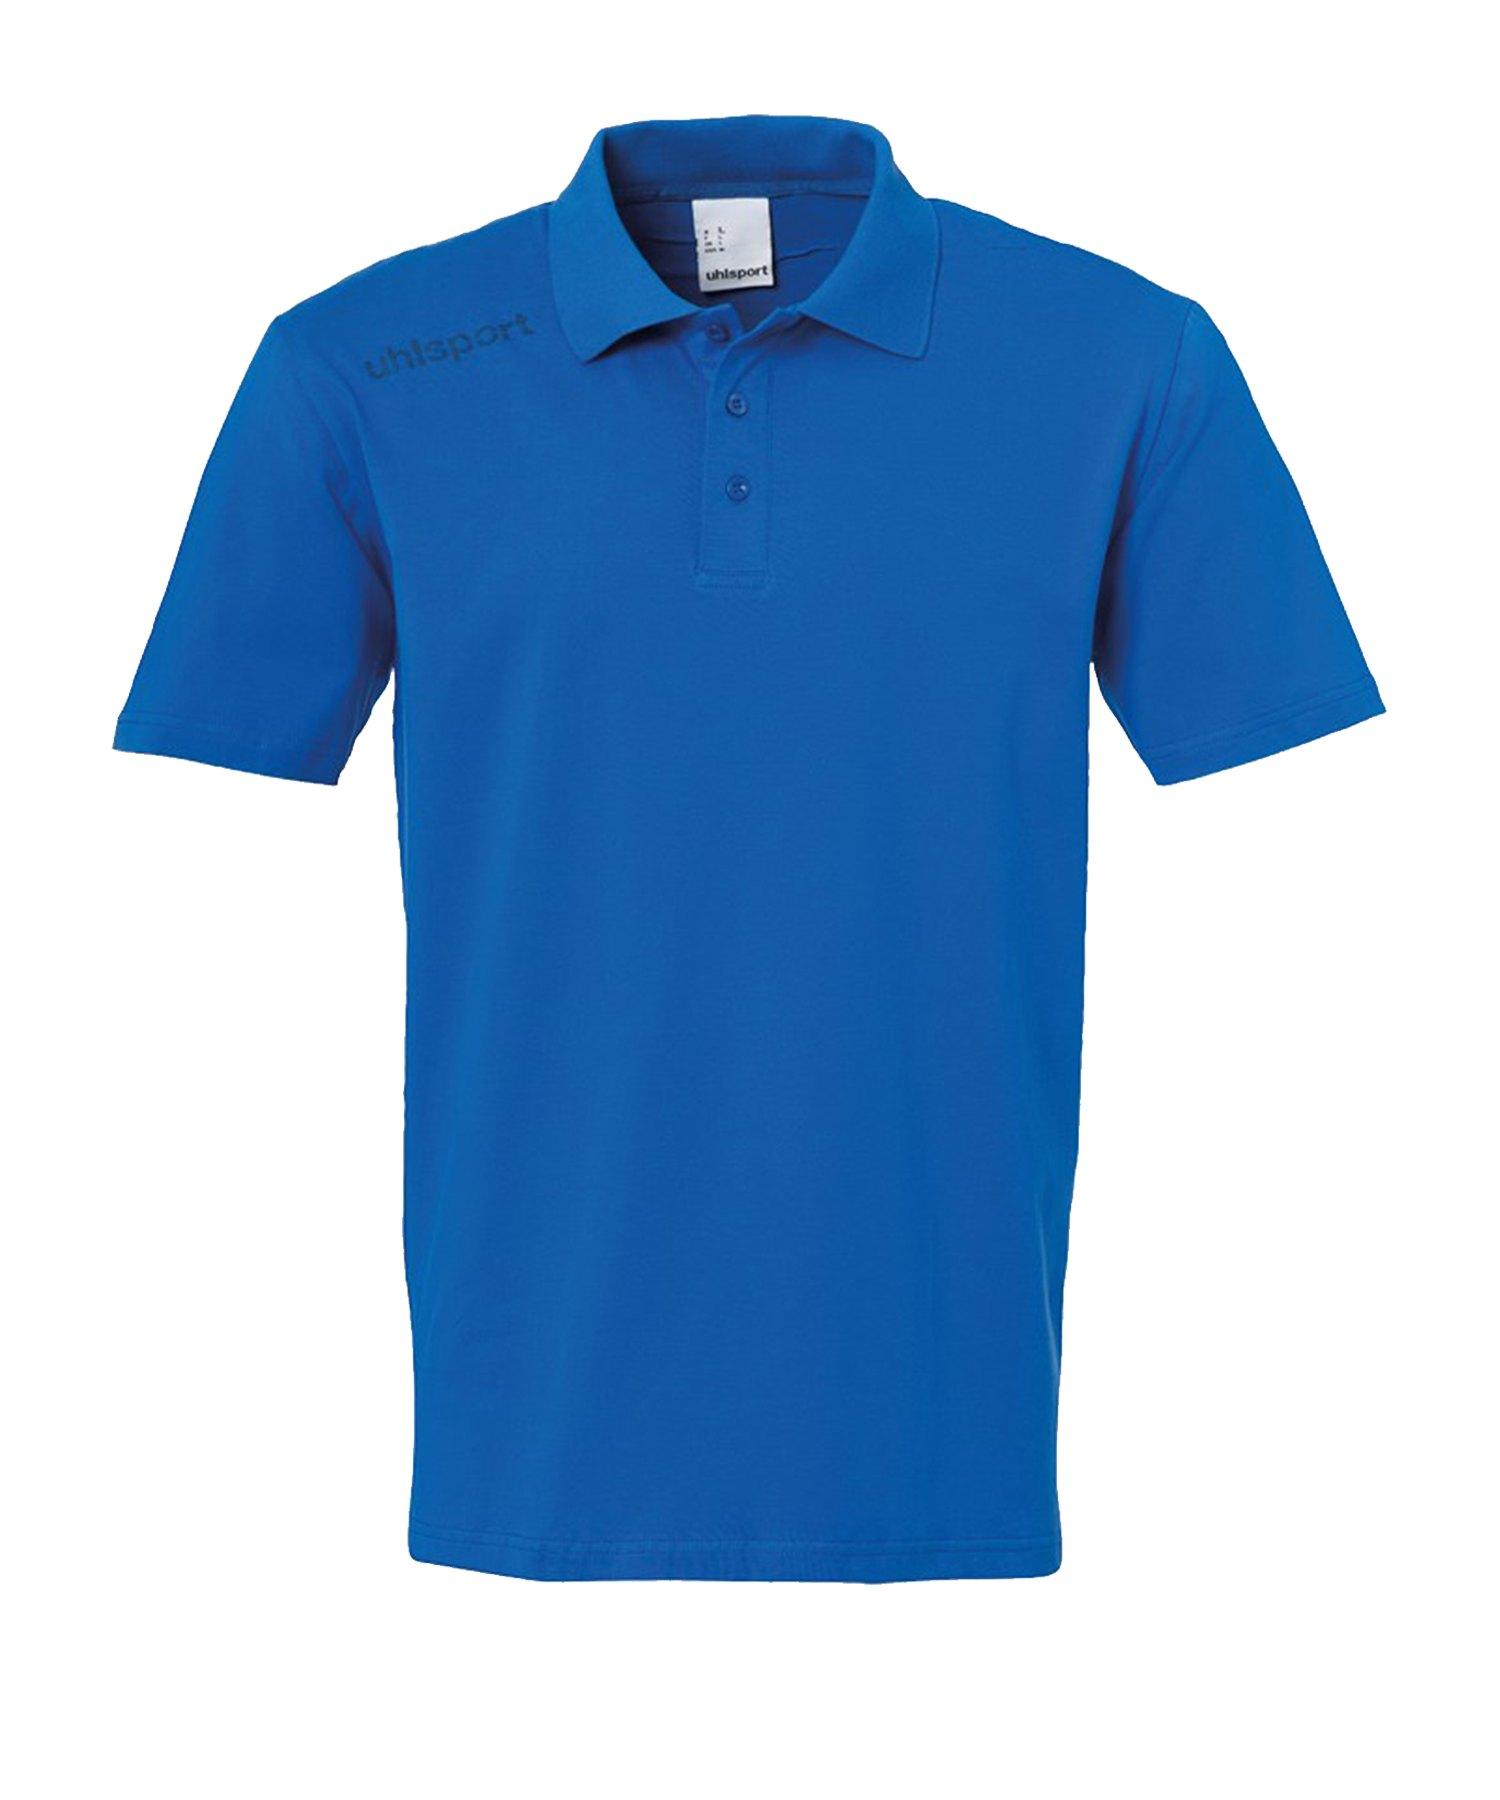 Uhlsport Essential Poloshirt Kids Blau F03 - Blau